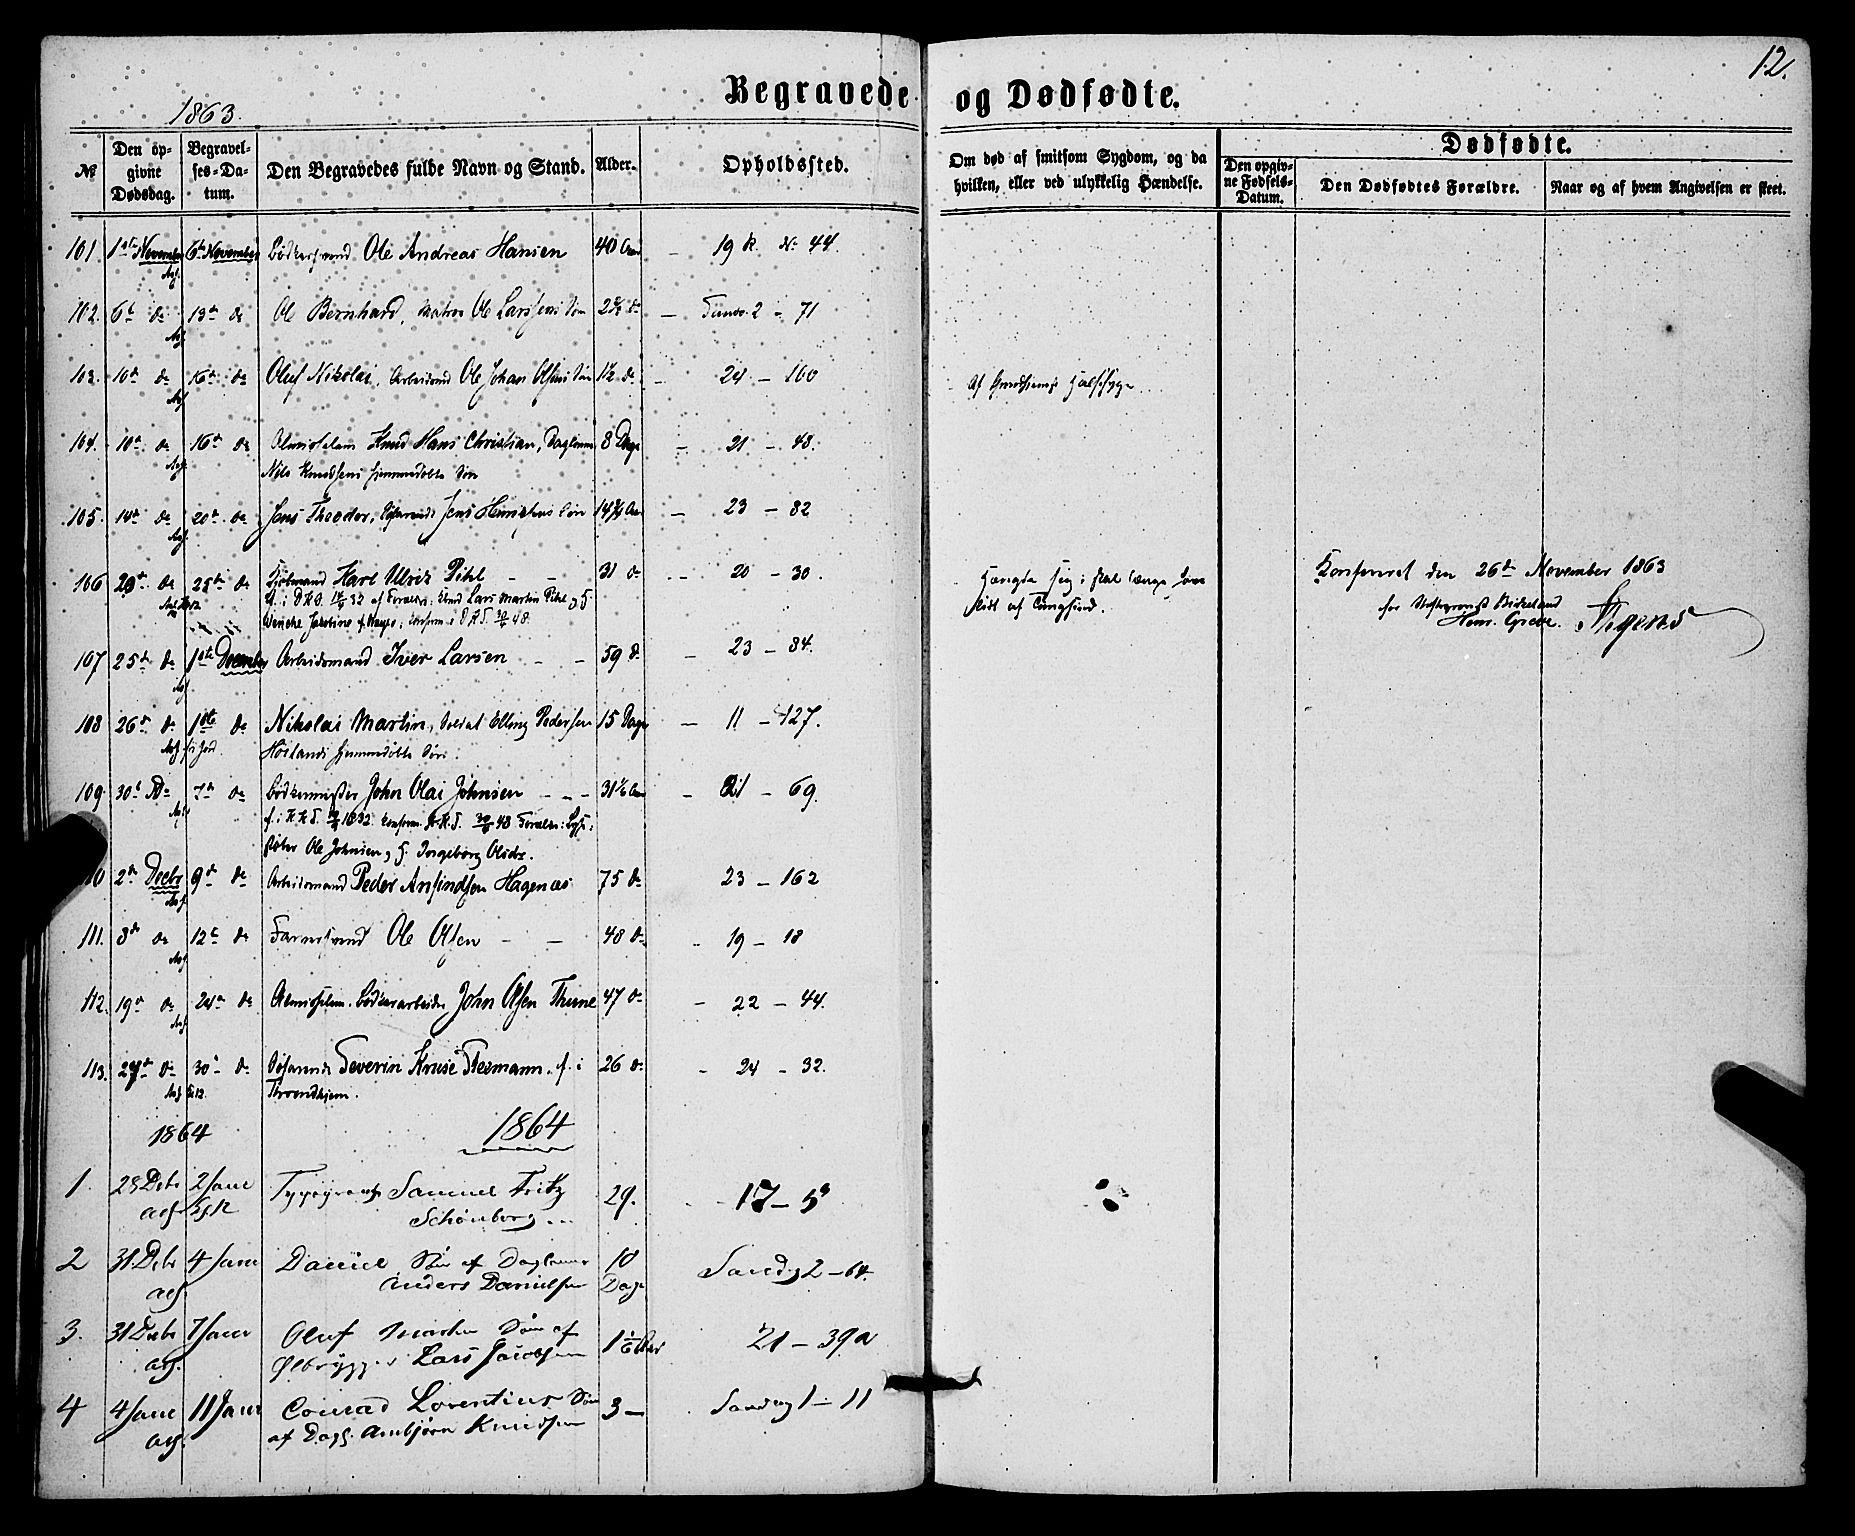 SAB, Korskirken Sokneprestembete, H/Haa/L0045: Ministerialbok nr. E 3, 1863-1875, s. 12